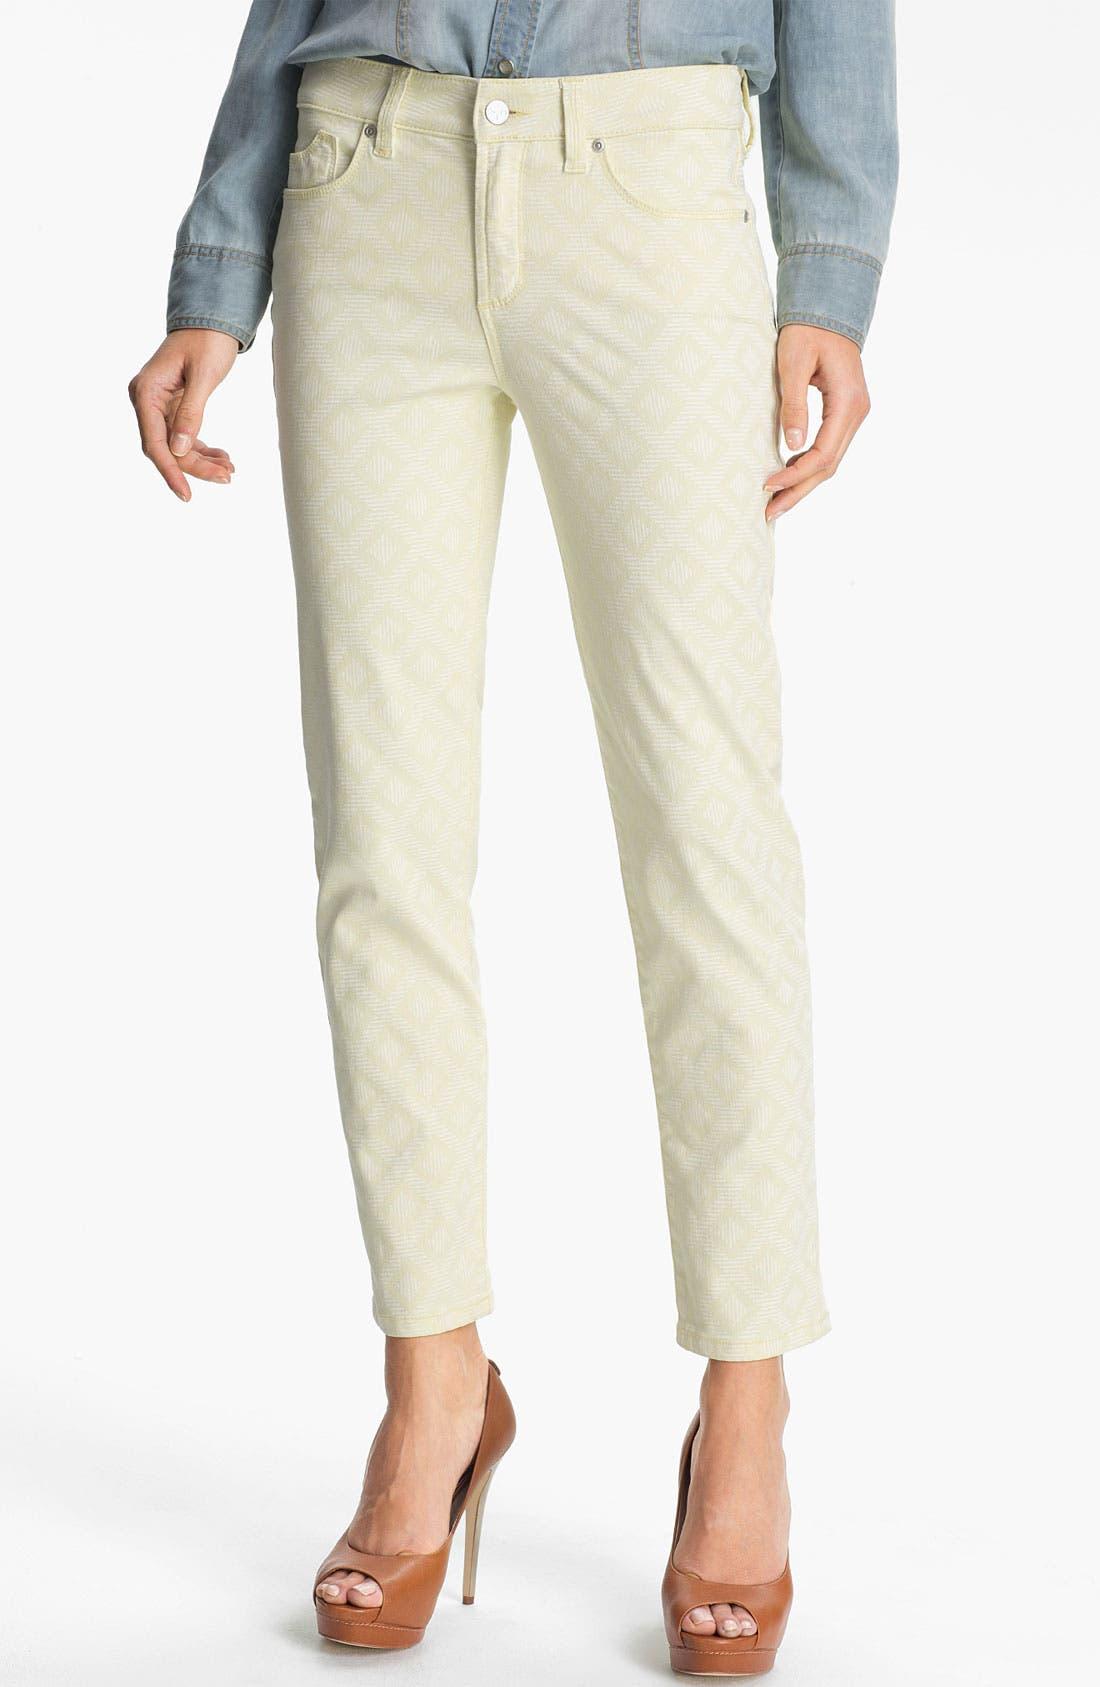 Main Image - NYDJ 'Alisha - Jacquard' Skinny Stretch Ankle Jeans